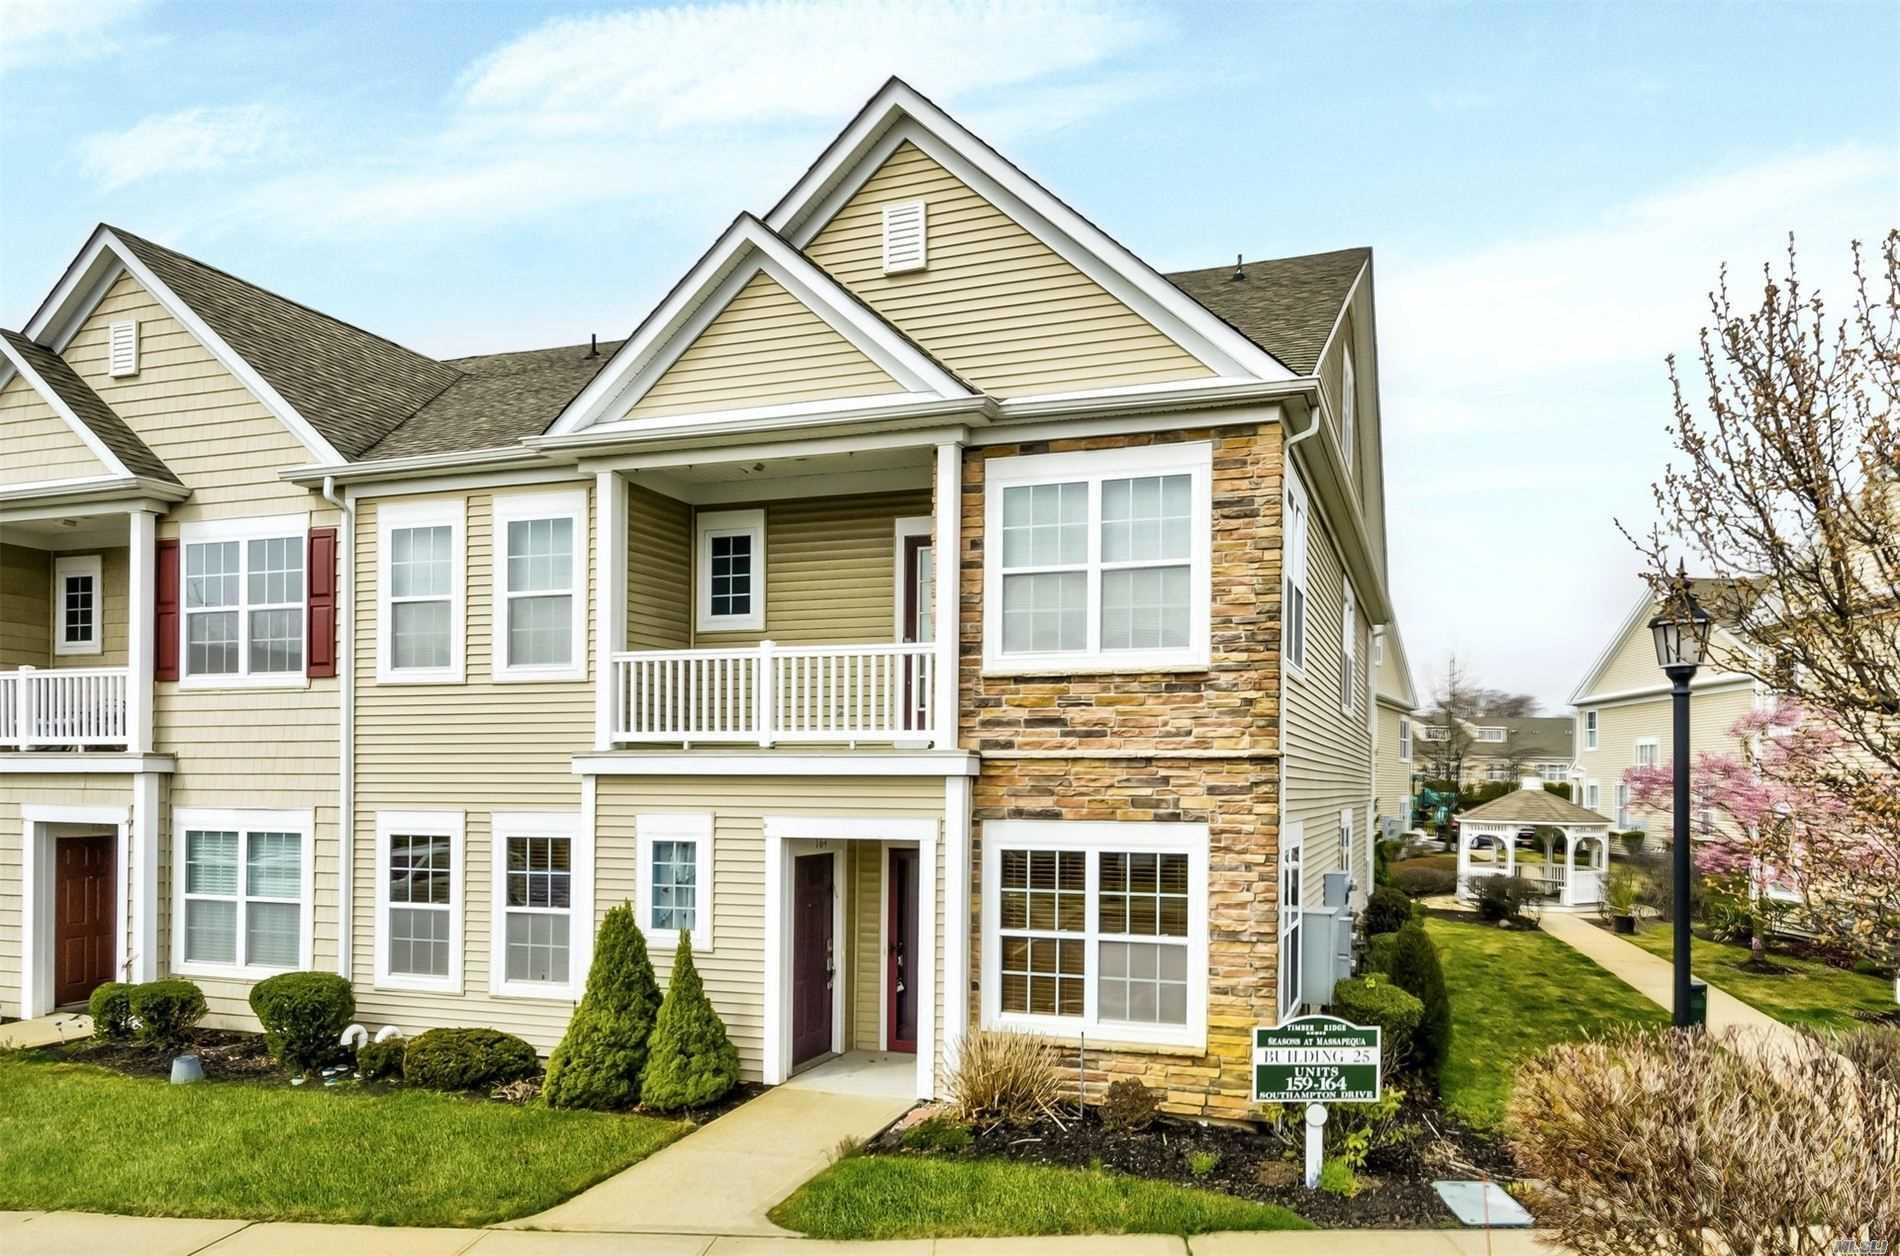 Property for sale at 163 Southampton Dr, Massapequa,  New York 11758